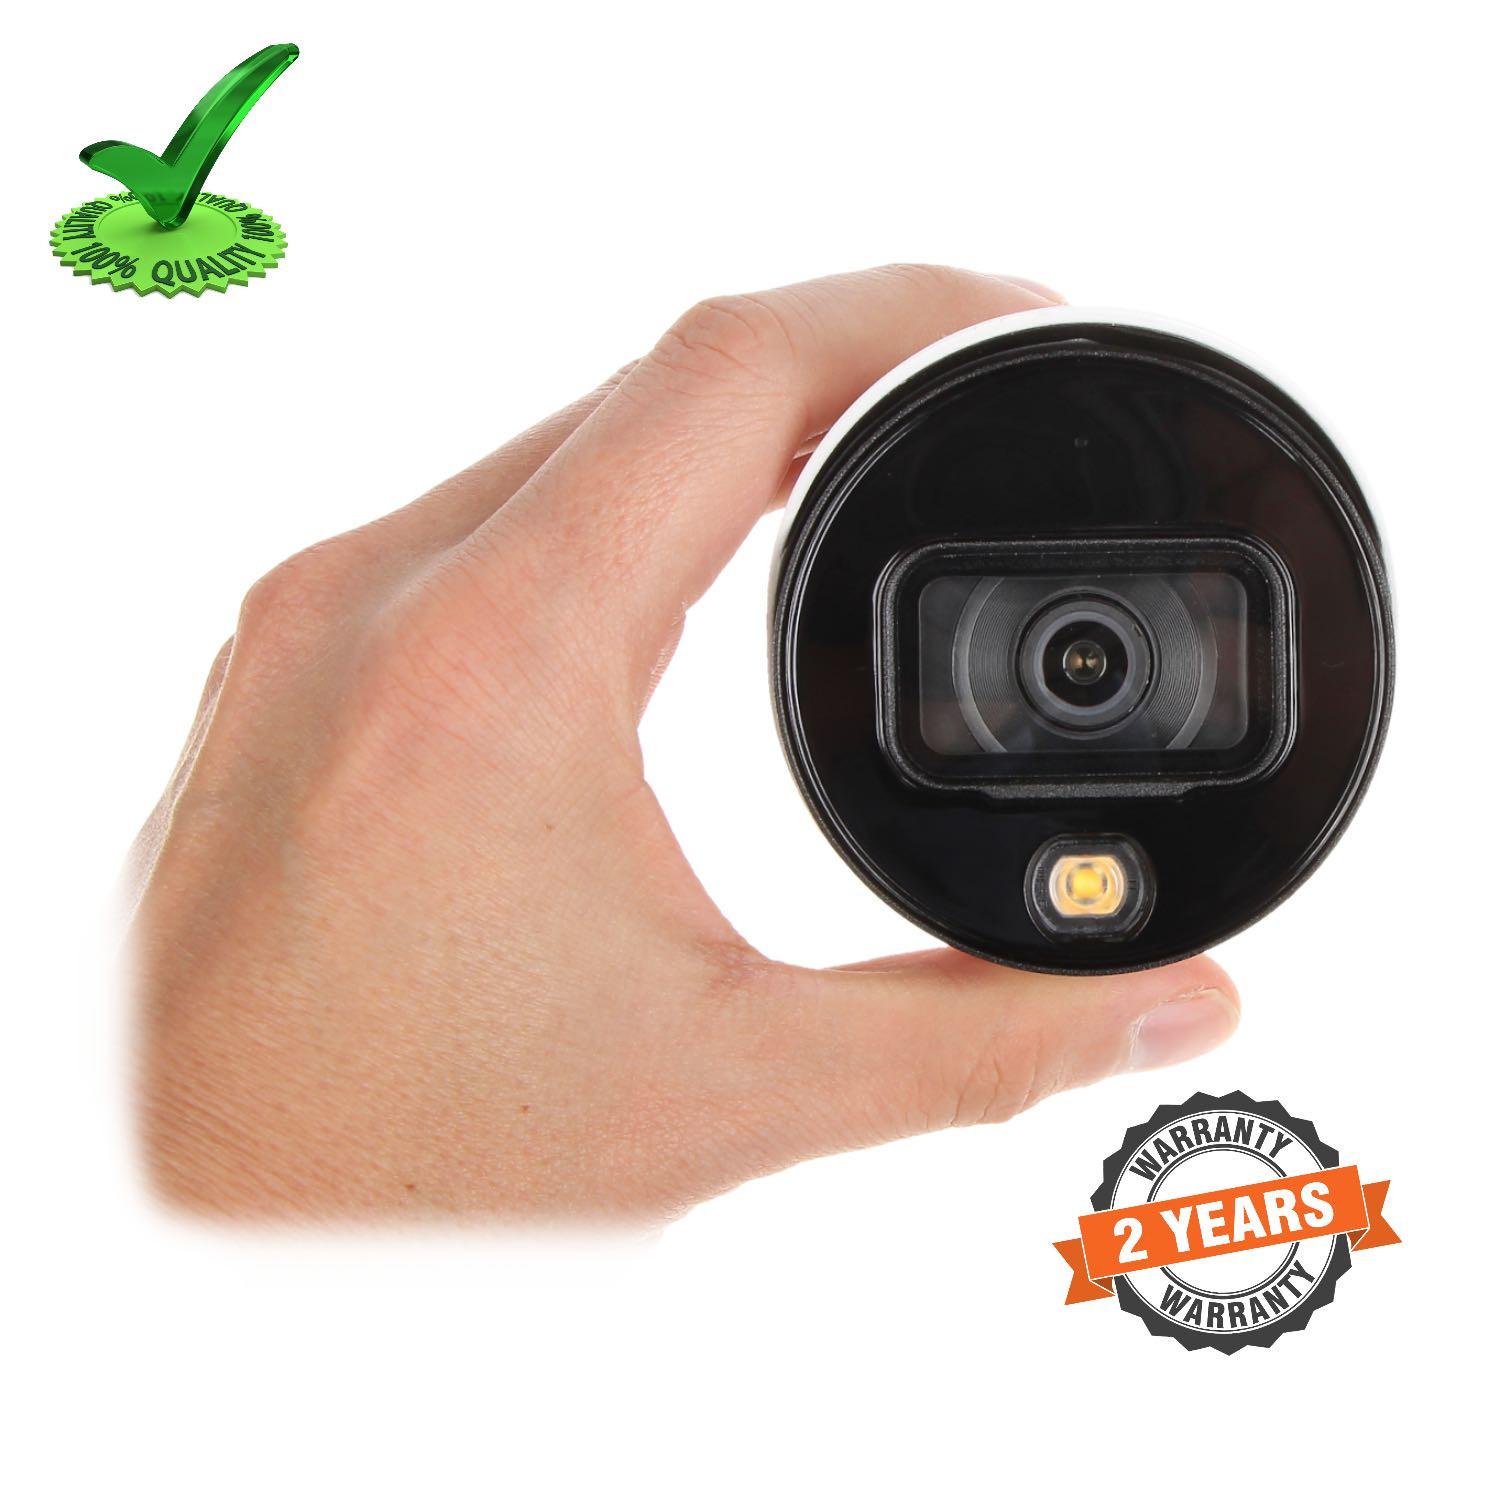 Dahua DH-HAC-HFW1239TP-LED 2Mp Full-color Starlight Bullet Camera